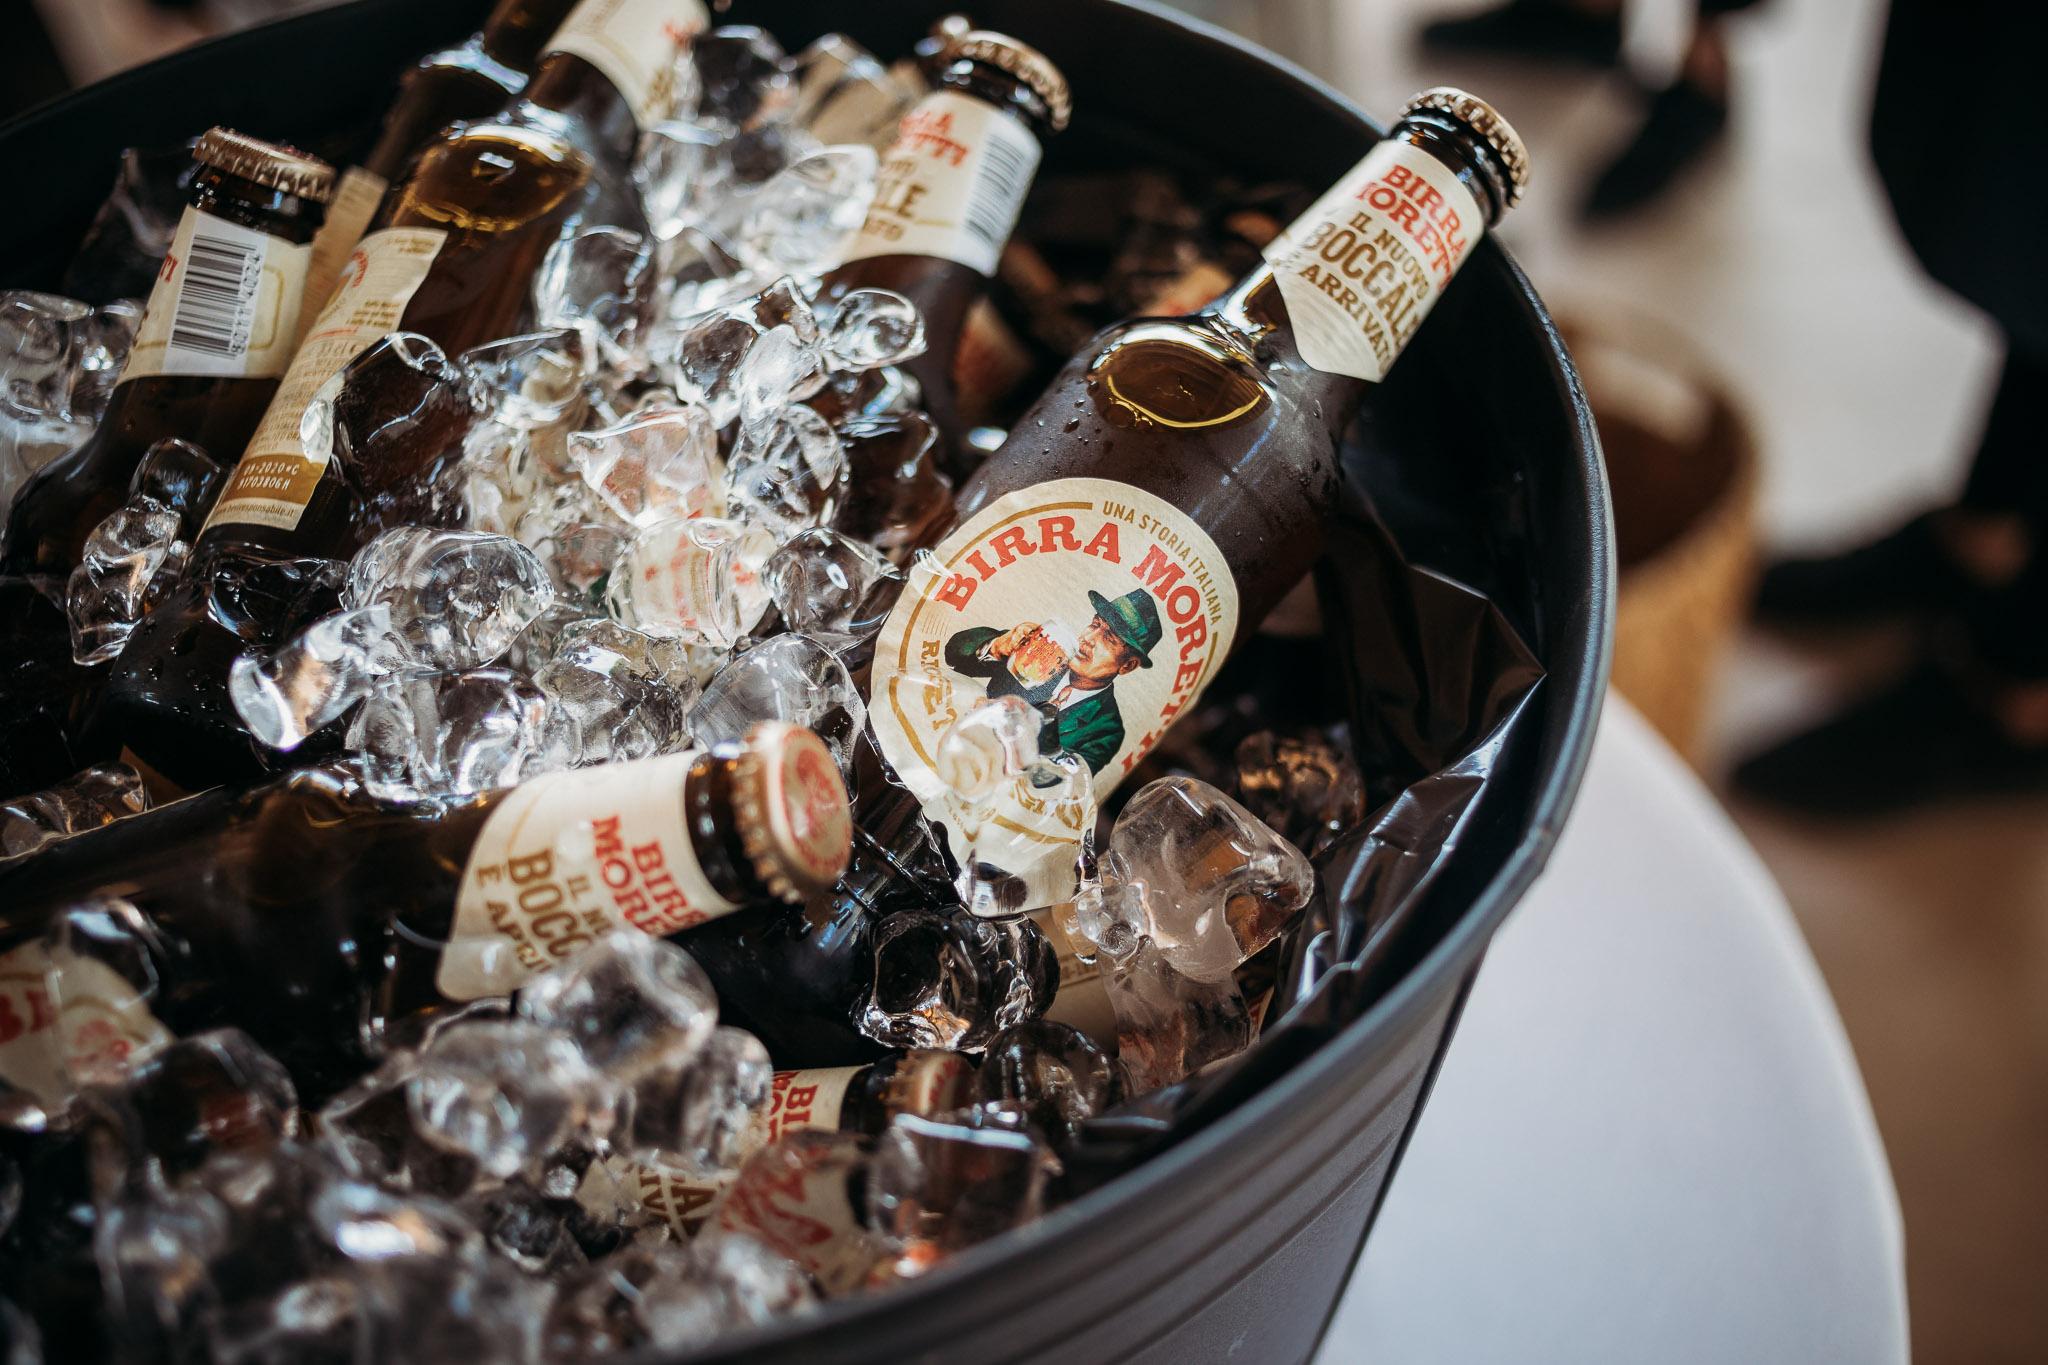 Italian beers at the wedding buffet at La Villa Hotel, Mombaruzzo